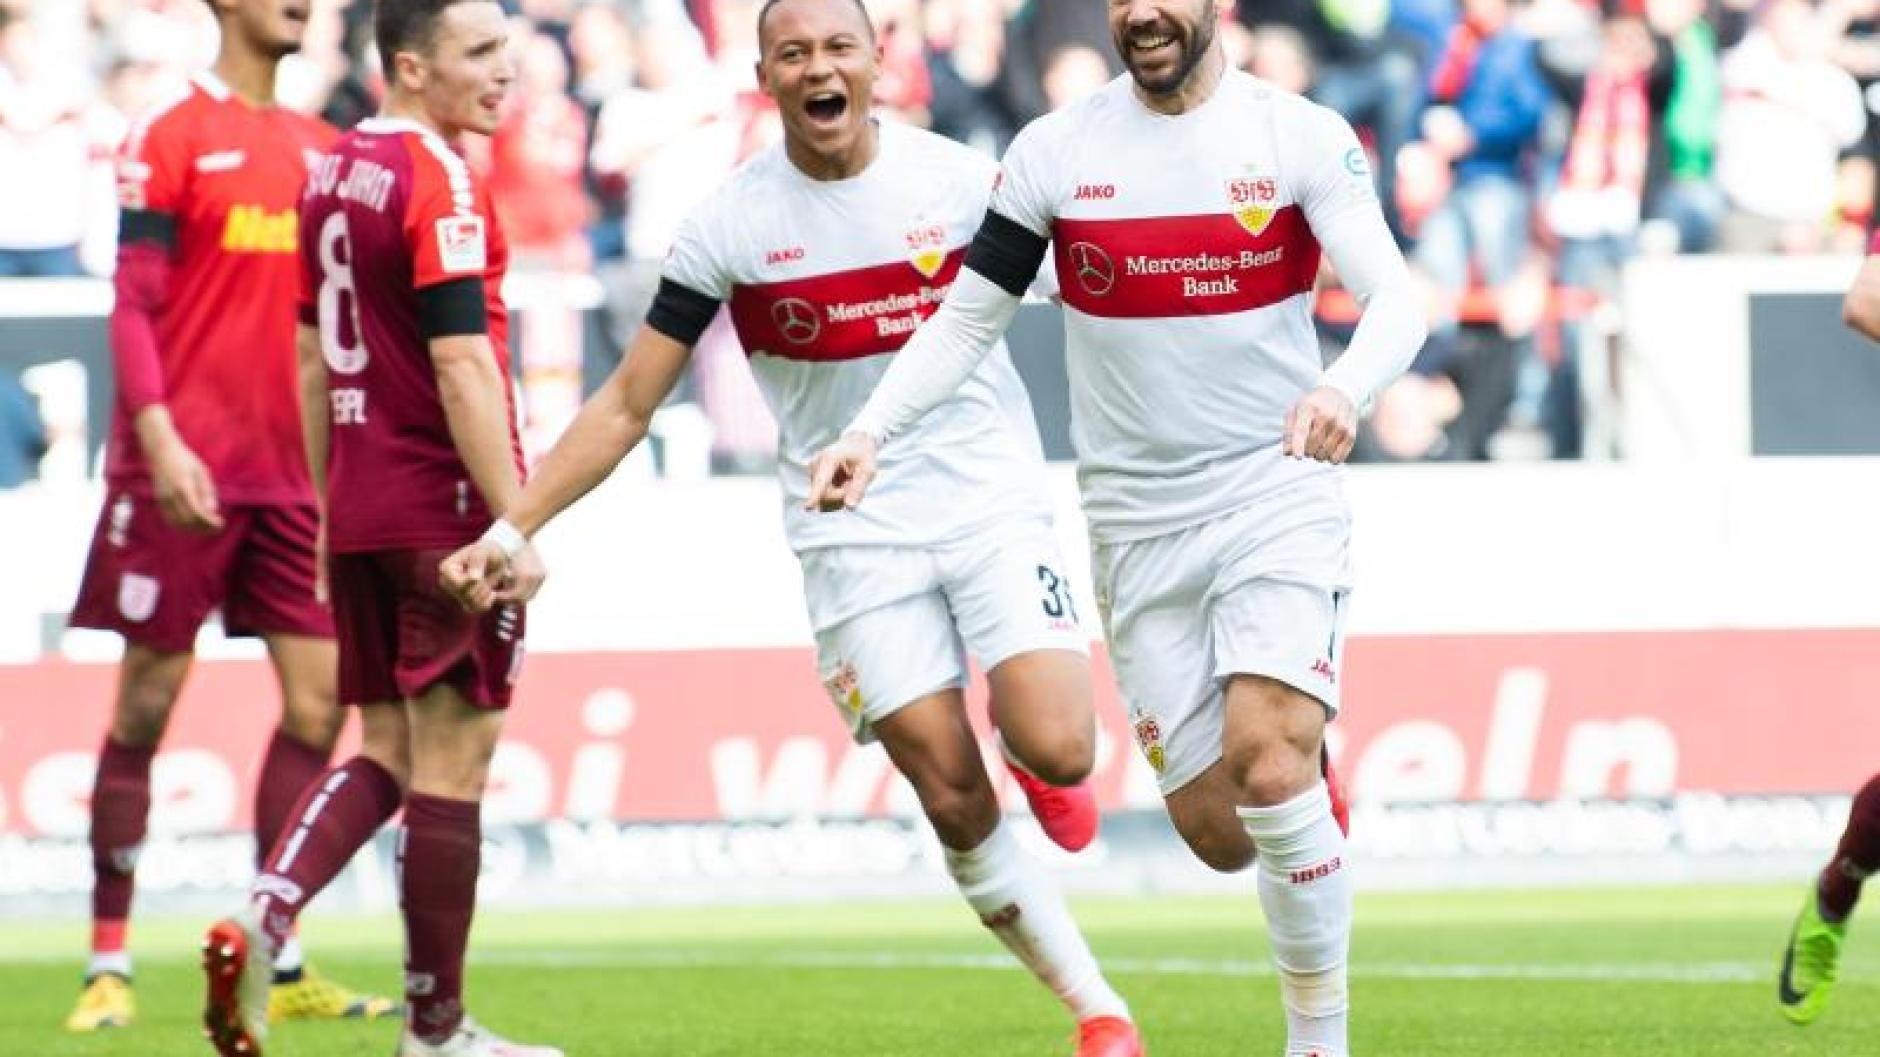 2 Bundesliga Vfb Stuttgart